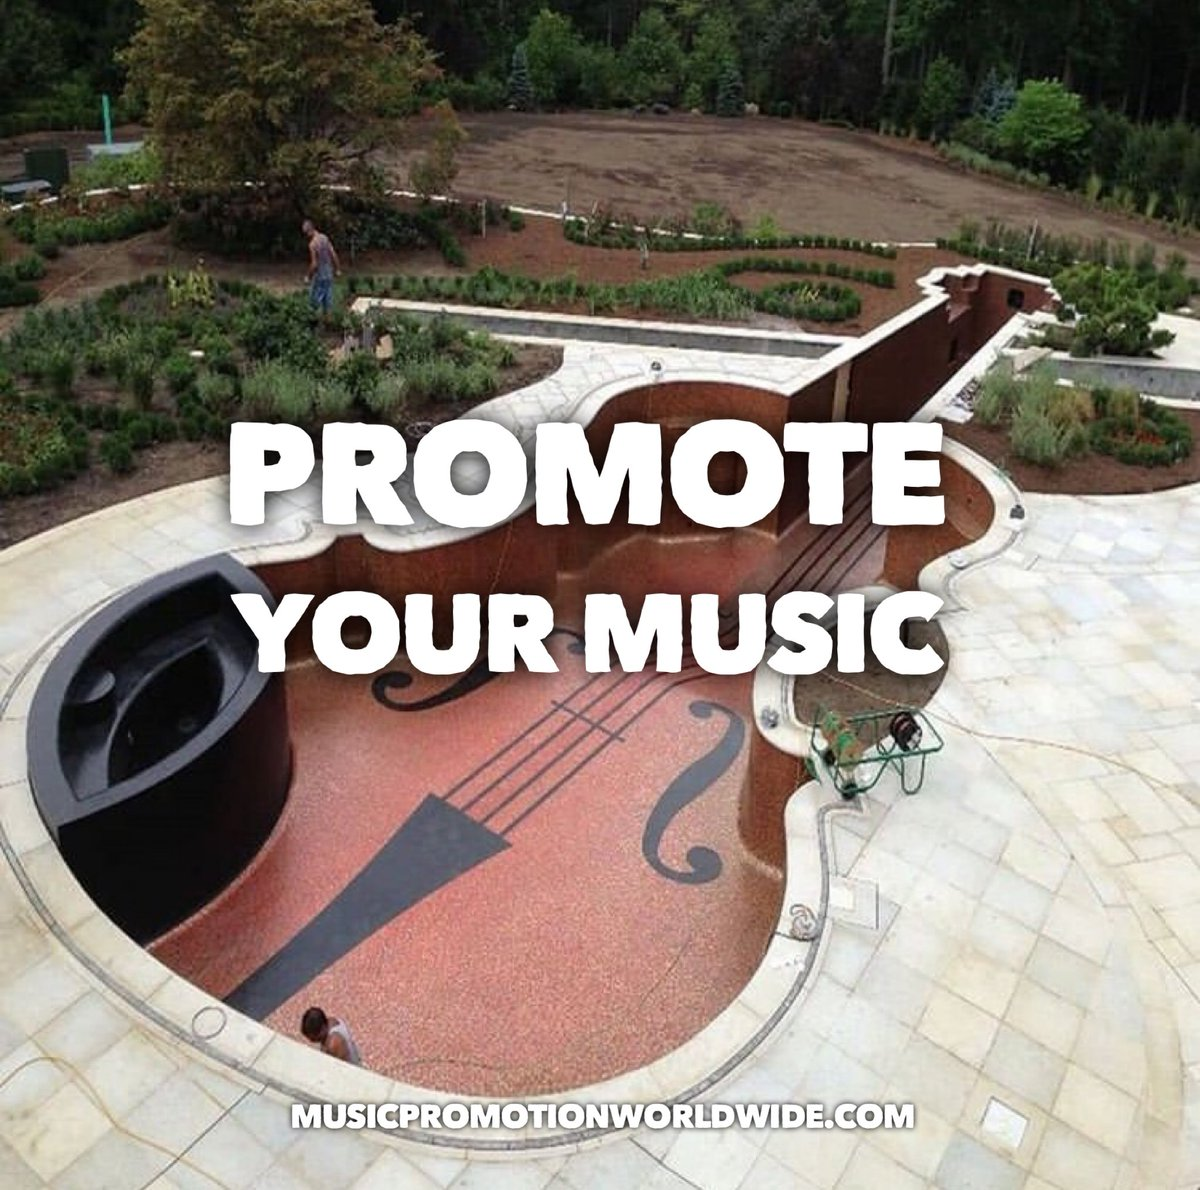 MusicPromotionWorld on Twitter: